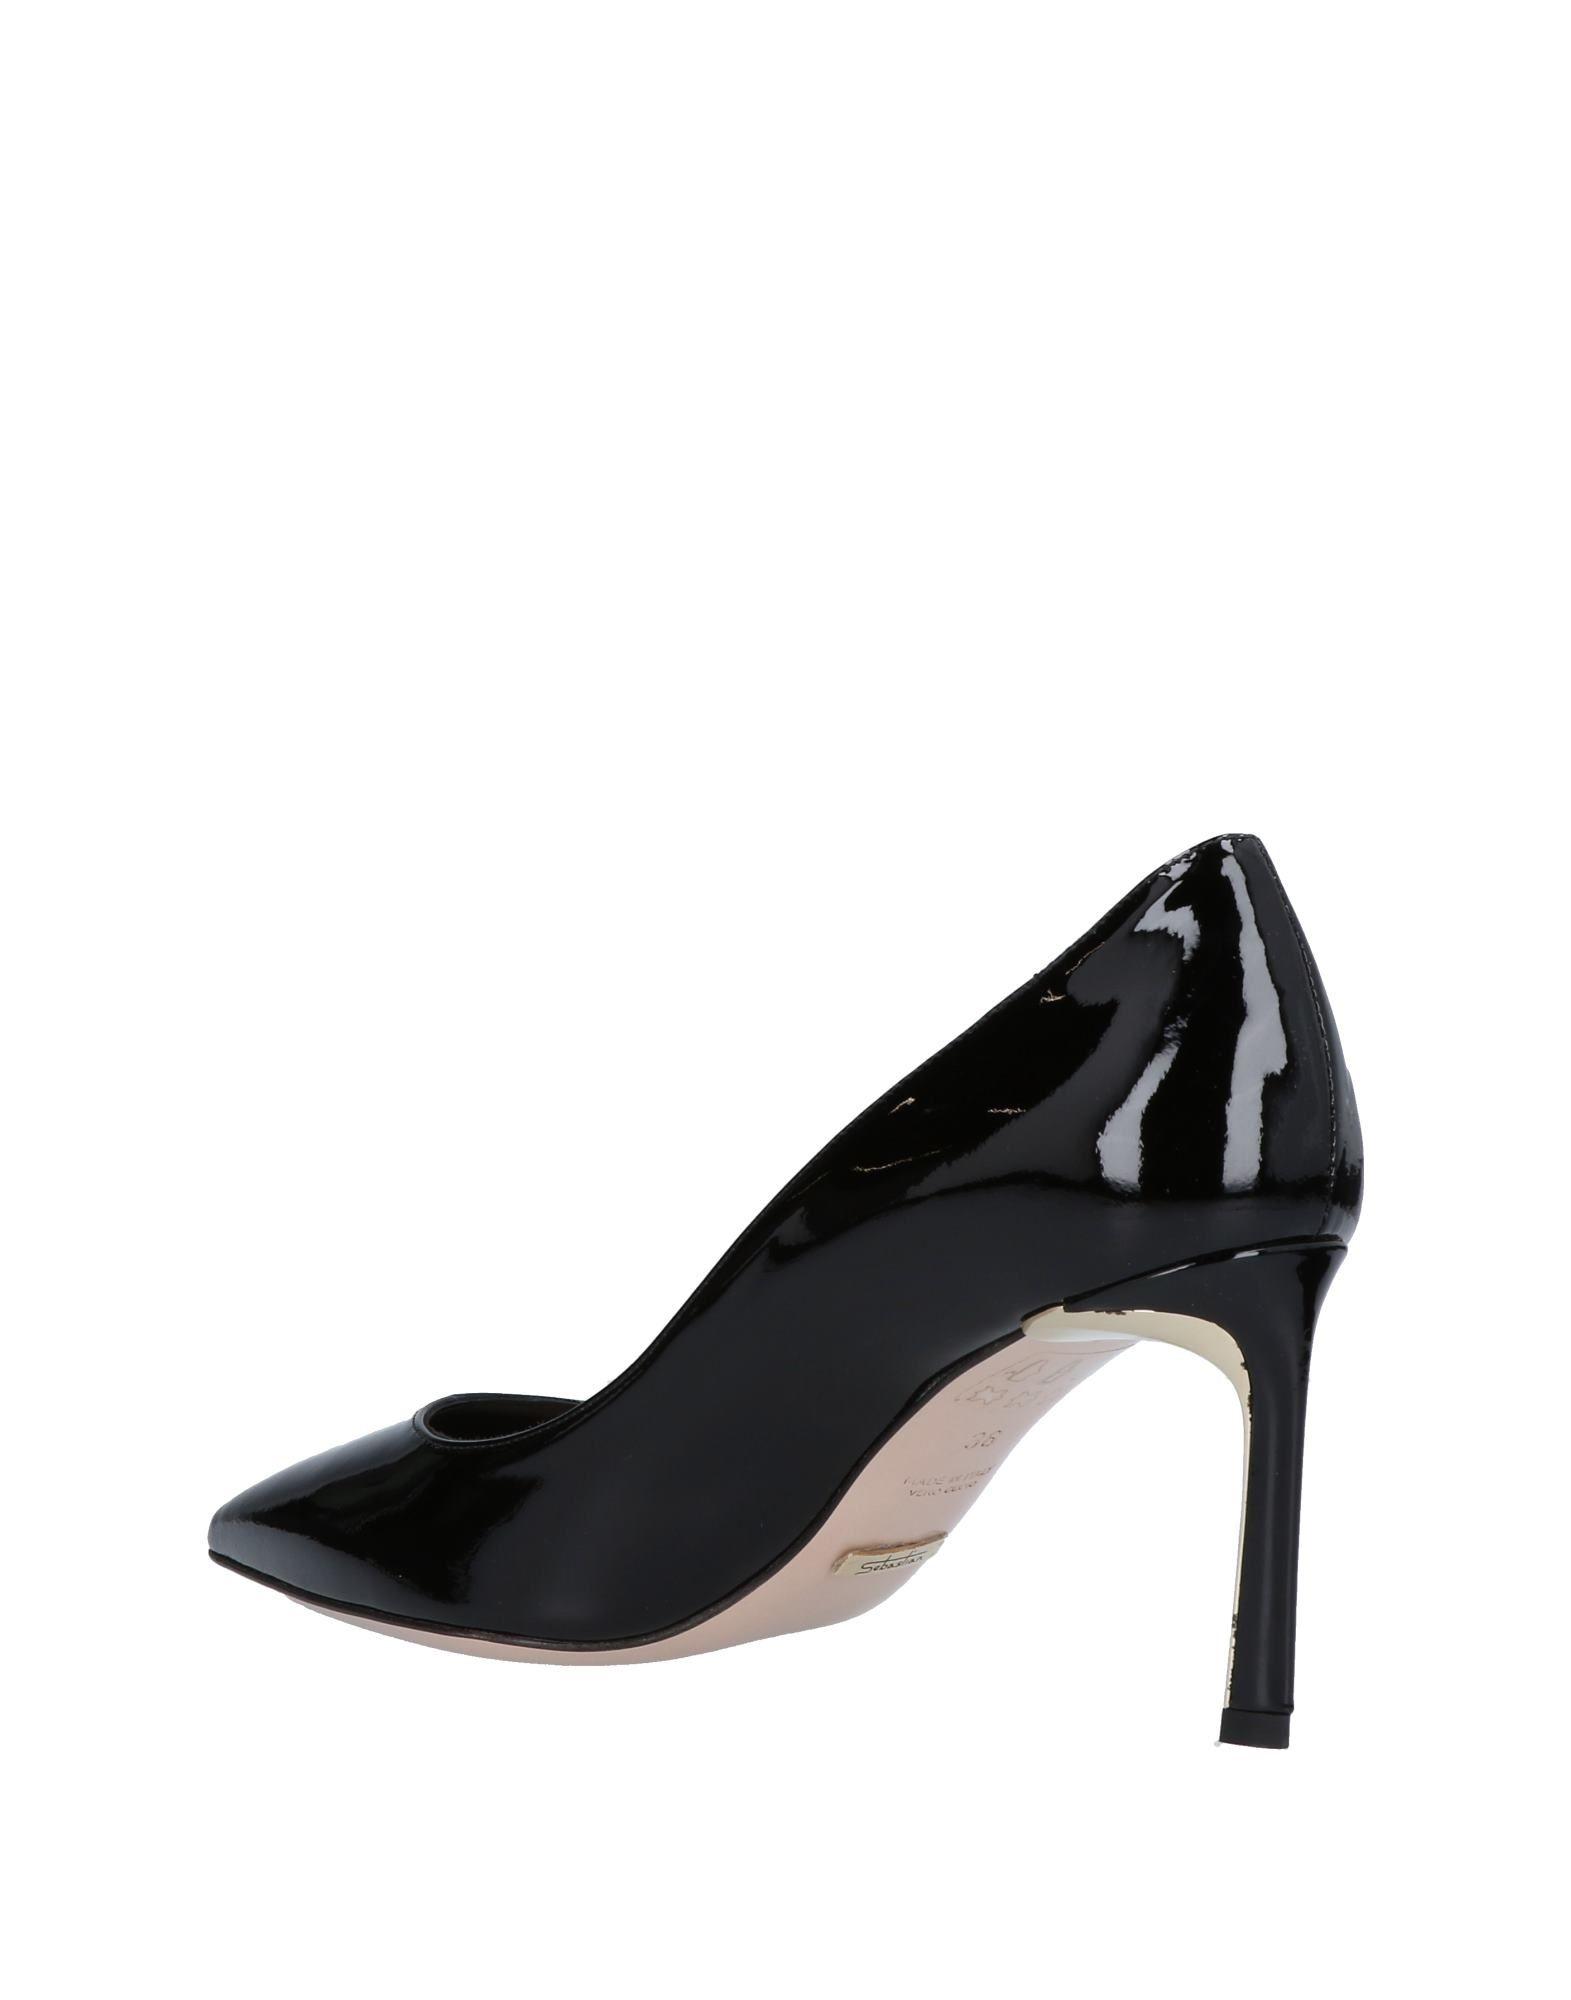 Haltbare Mode Pumps billige Schuhe Sebastian Pumps Mode Damen  11472193TN Heiße Schuhe c30ece